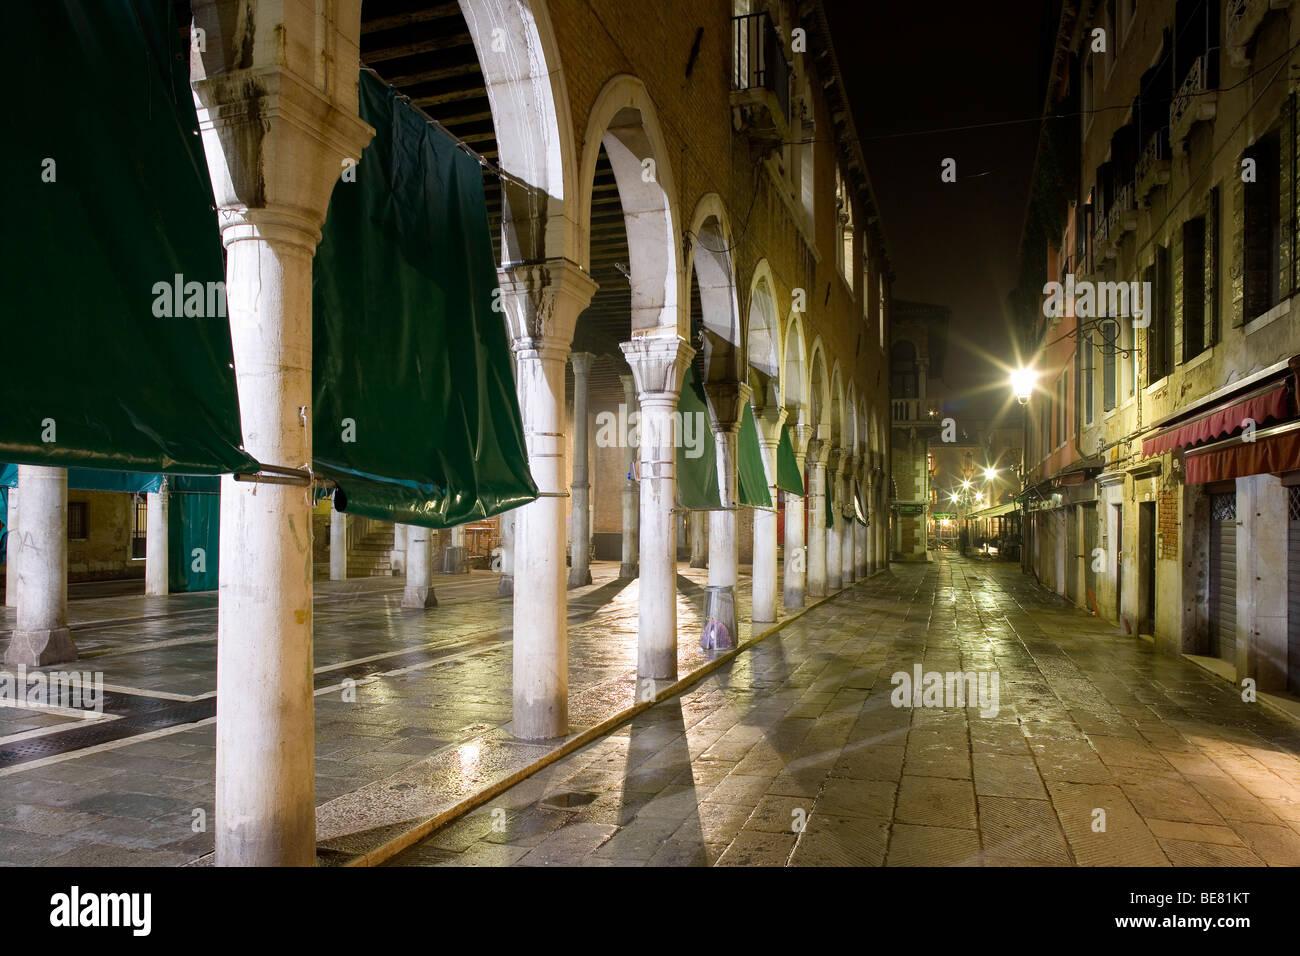 Fish market at night, Mercato del Pesce, Calle de le Becarie o Panataria, Venice, Italy, Europe - Stock Image